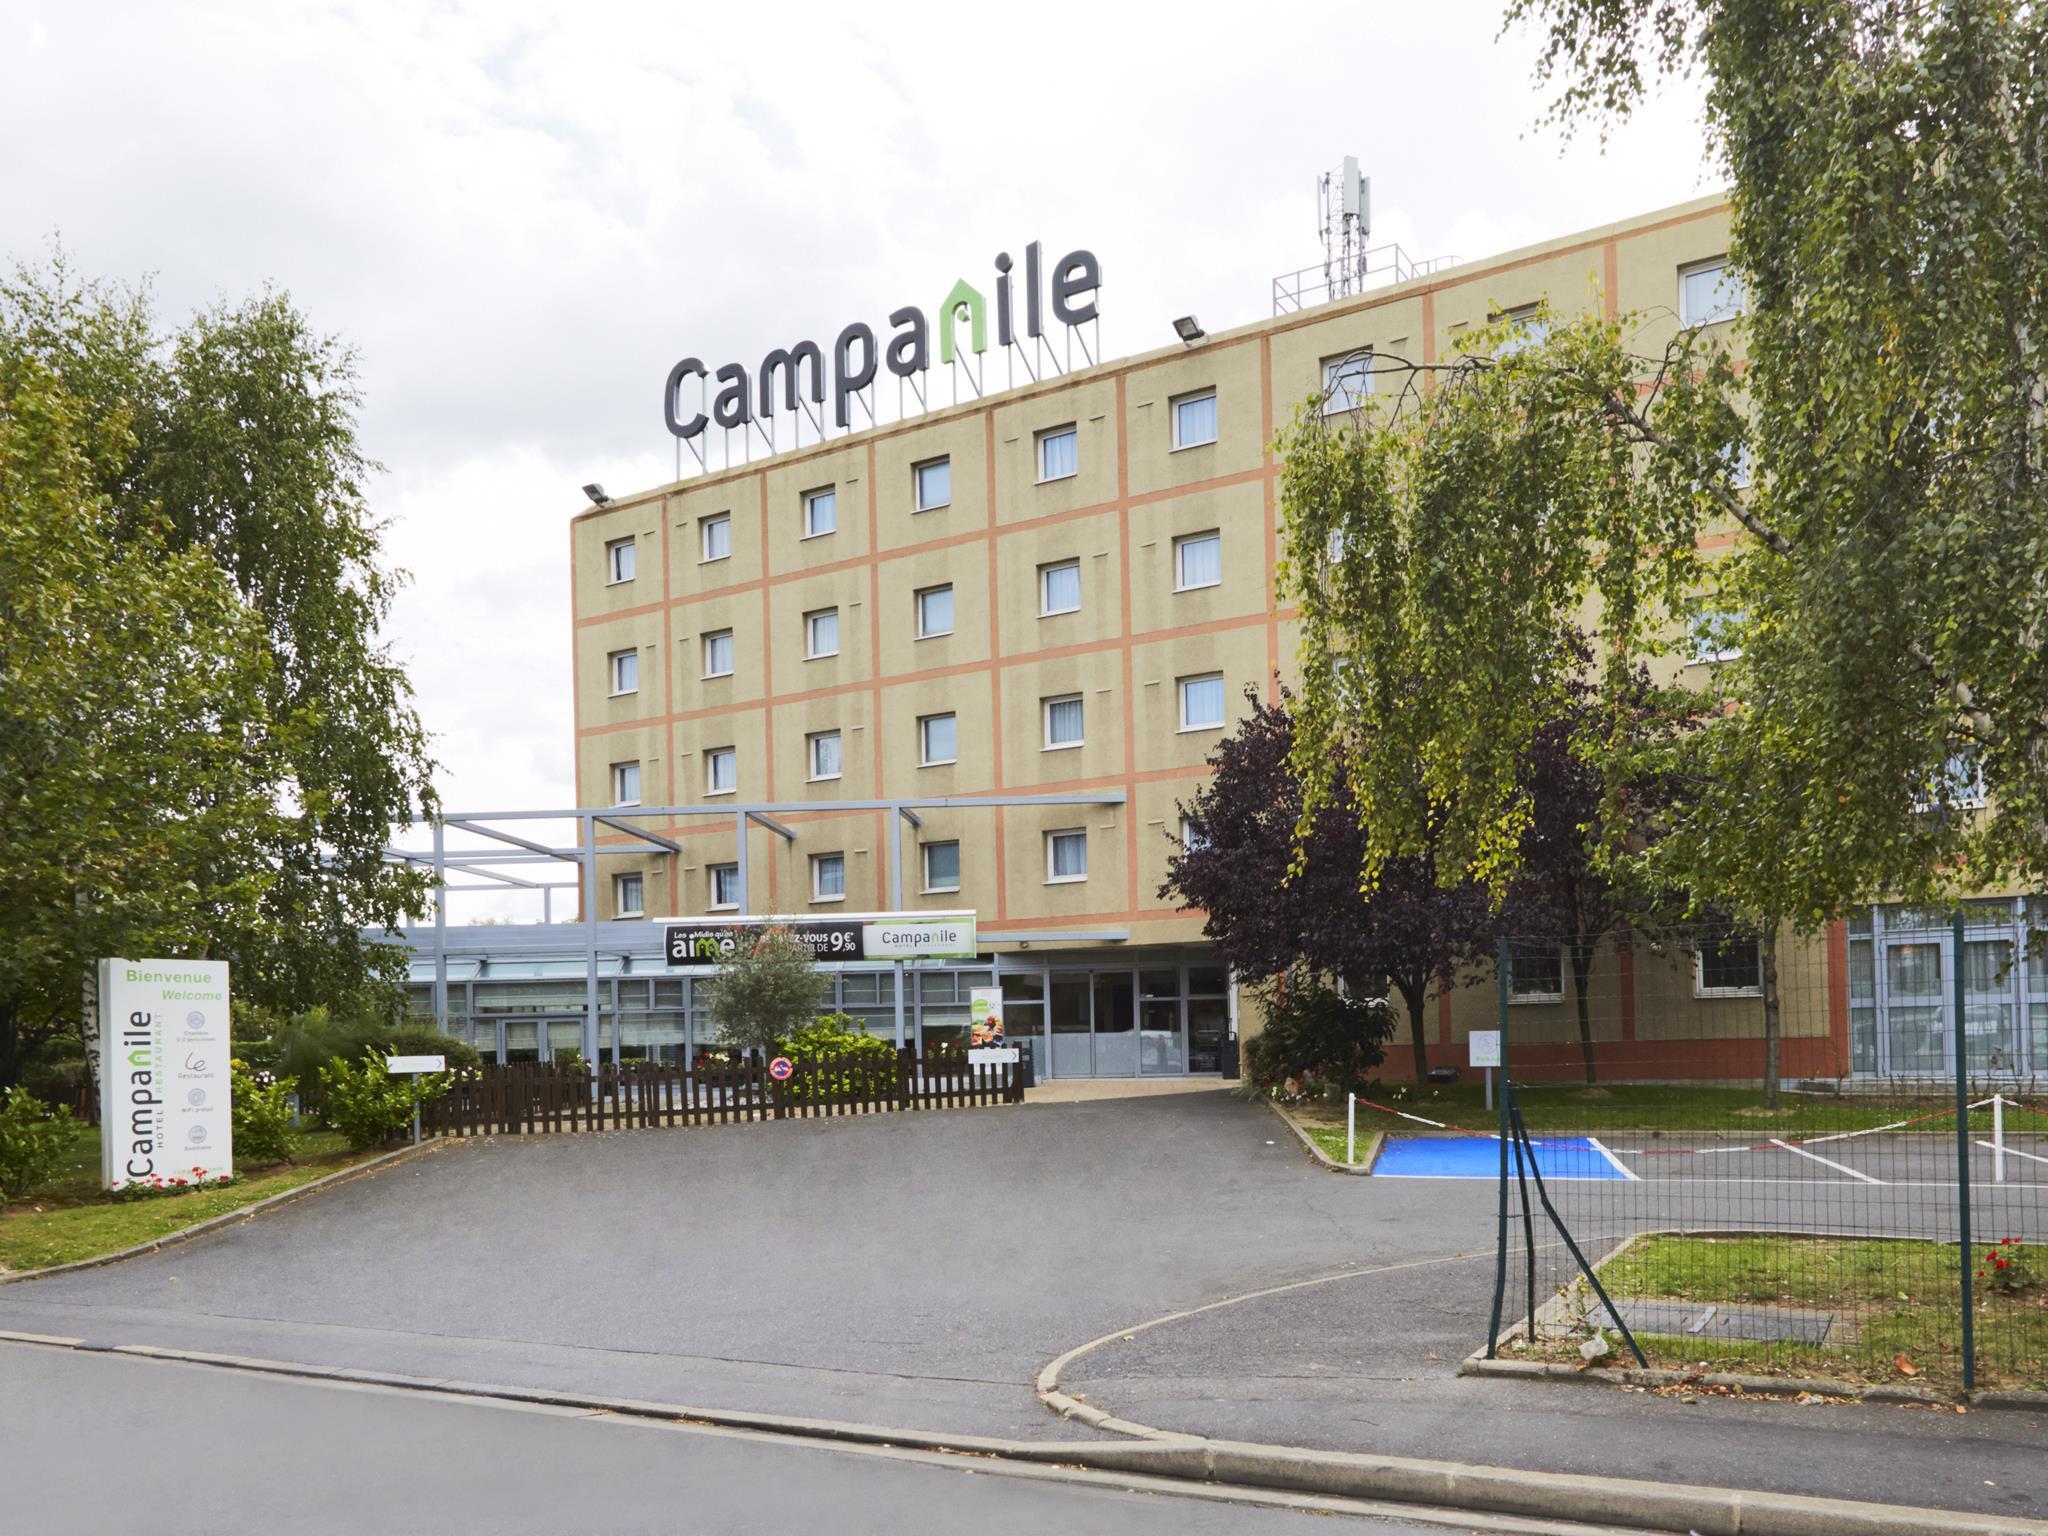 Campanile Hotel Argenteuil